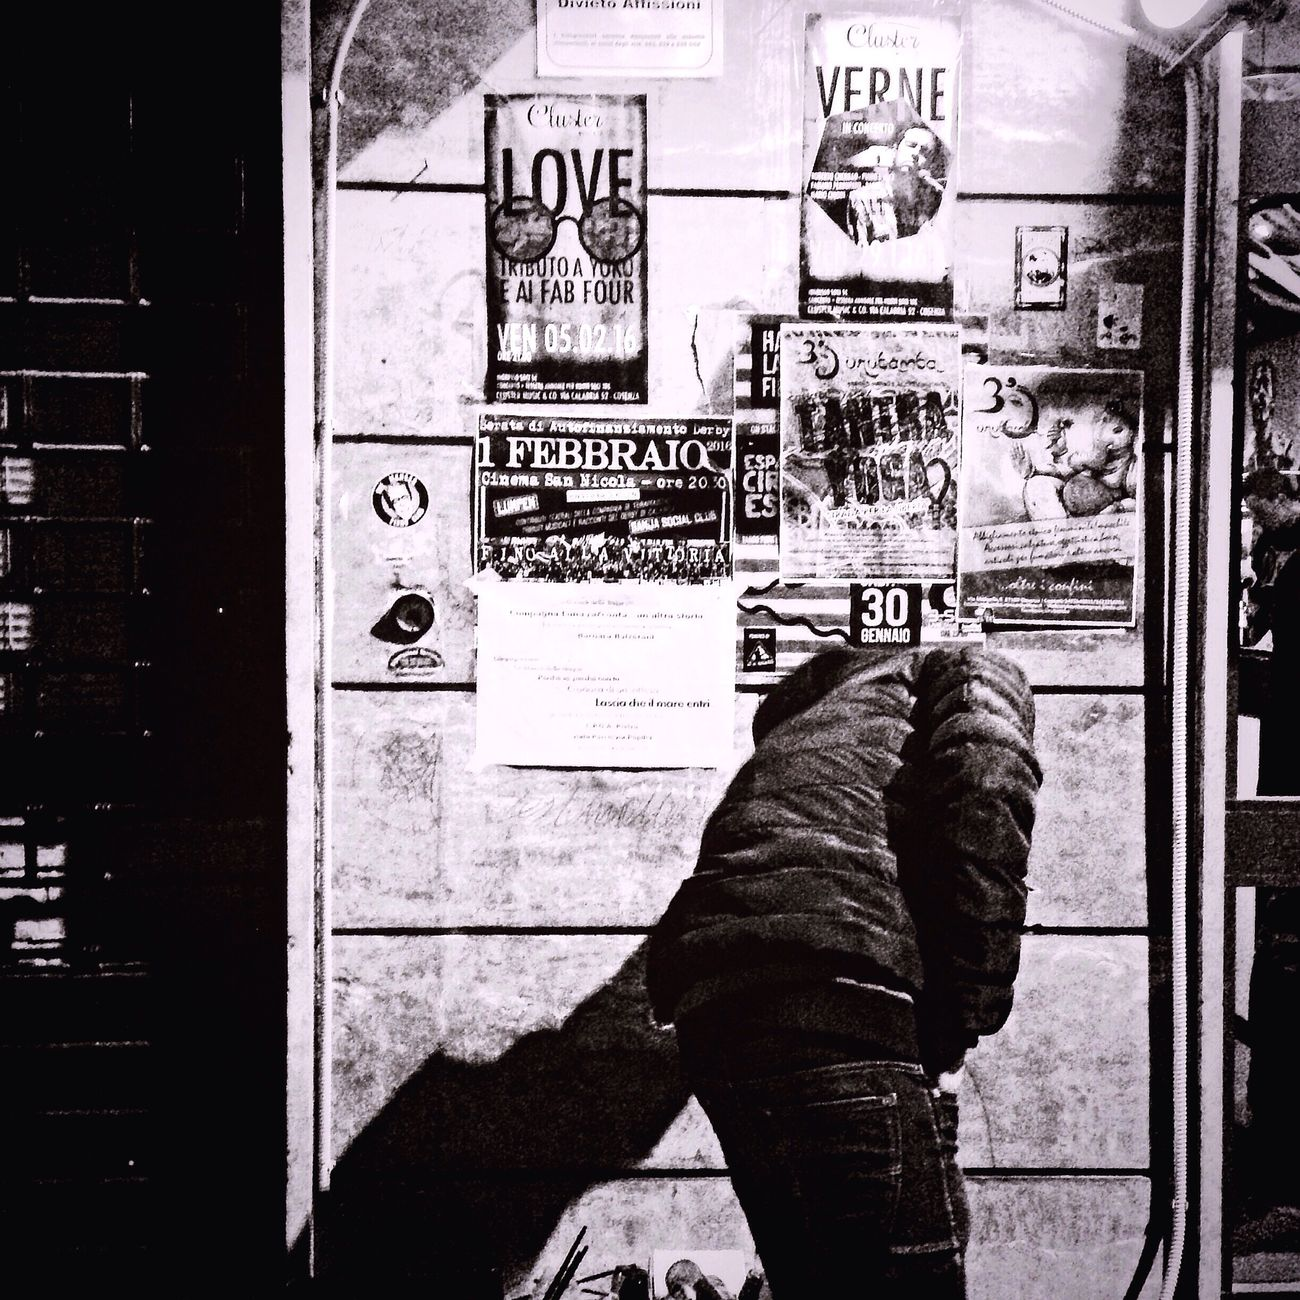 Strangers Urban Streetphotography Blancoynegro Black And White Blackandwhite Urbanstrangers Urbanphotography IPhoneography BW_photography Bw_lover Italia Cosenza Streetphoto_bw